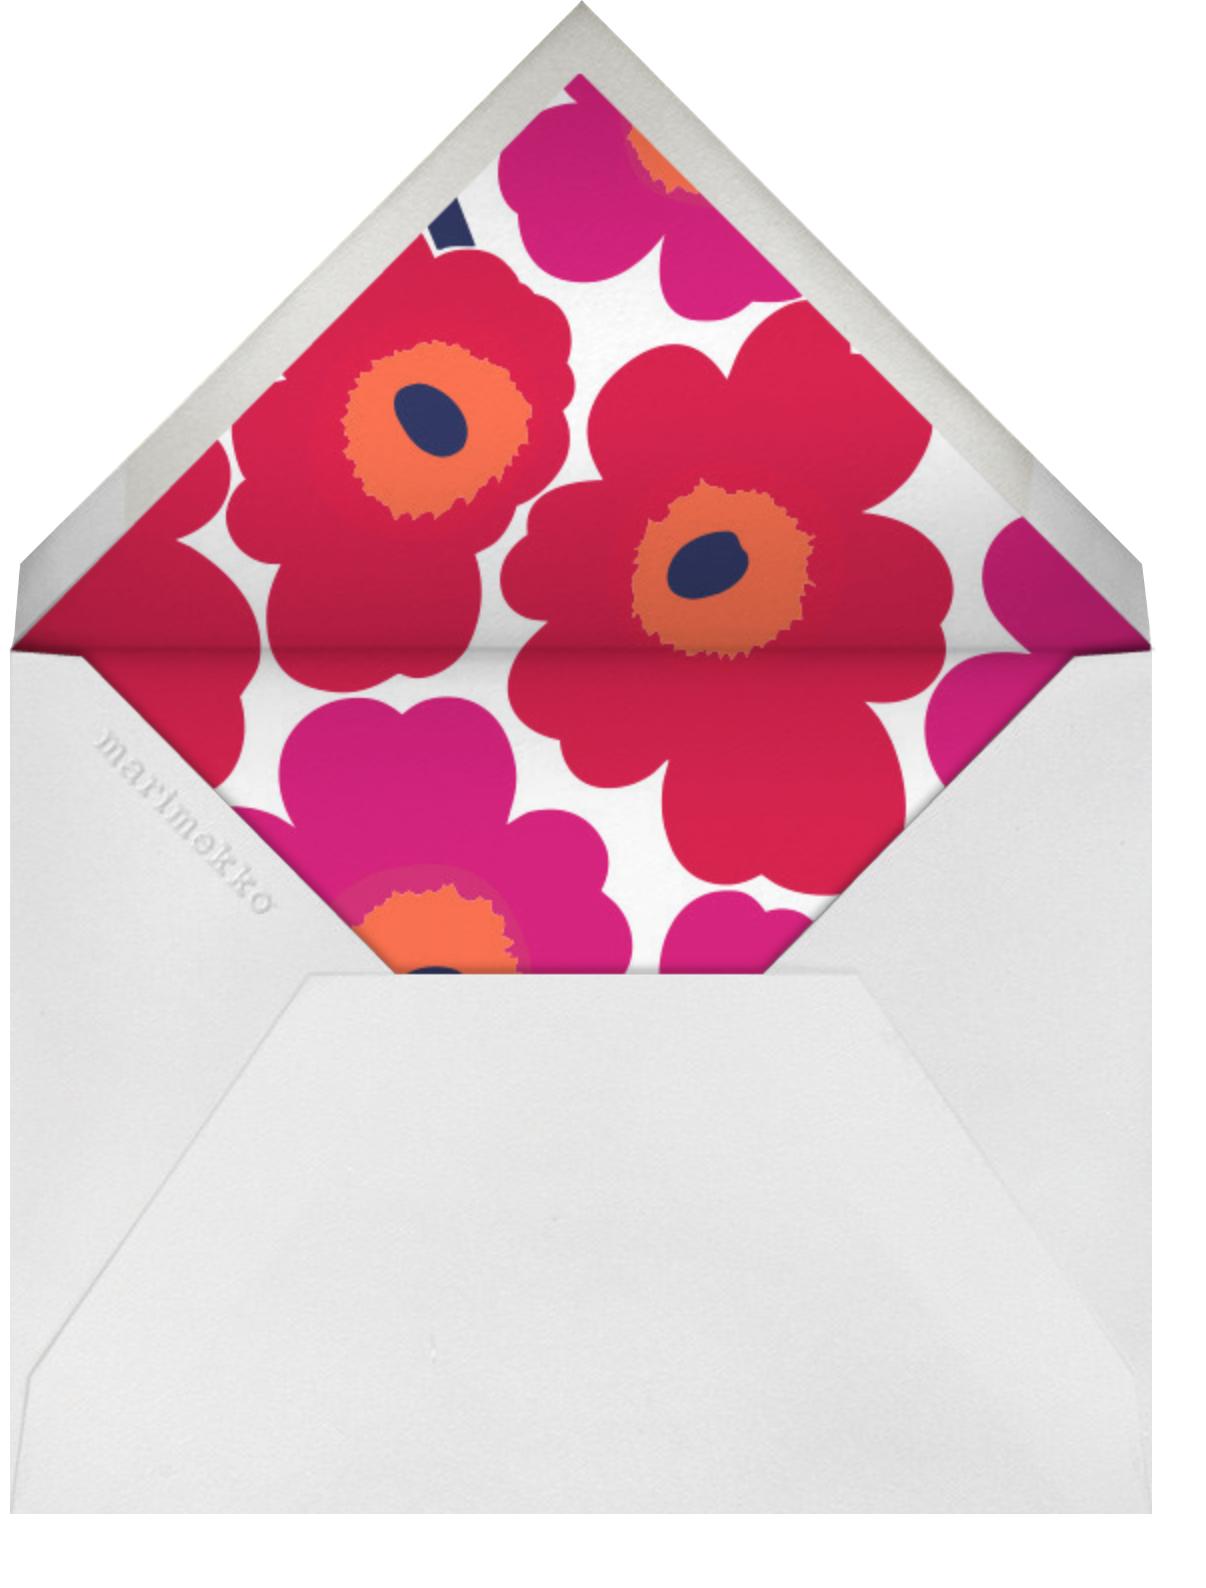 Unikko (Square) - Red - Marimekko - Picnic - envelope back